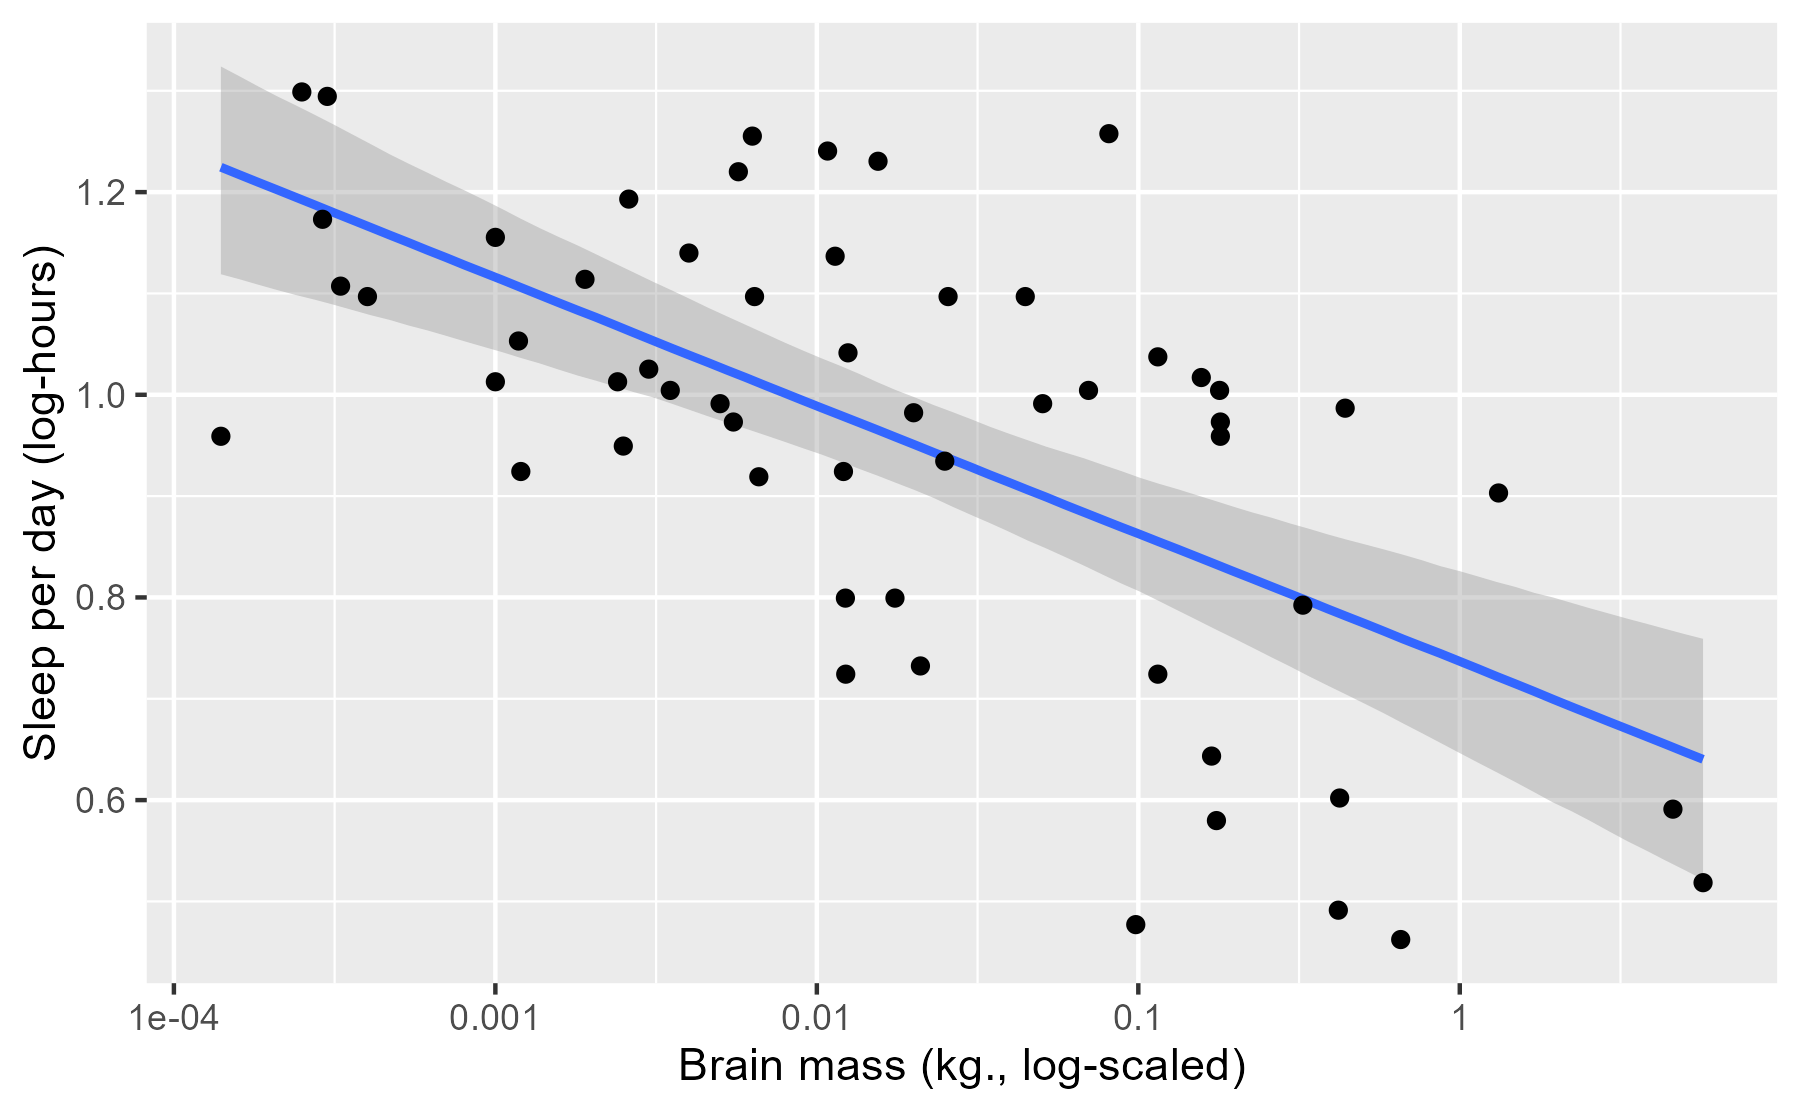 RStanARM basics: visualizing uncertainty in linear